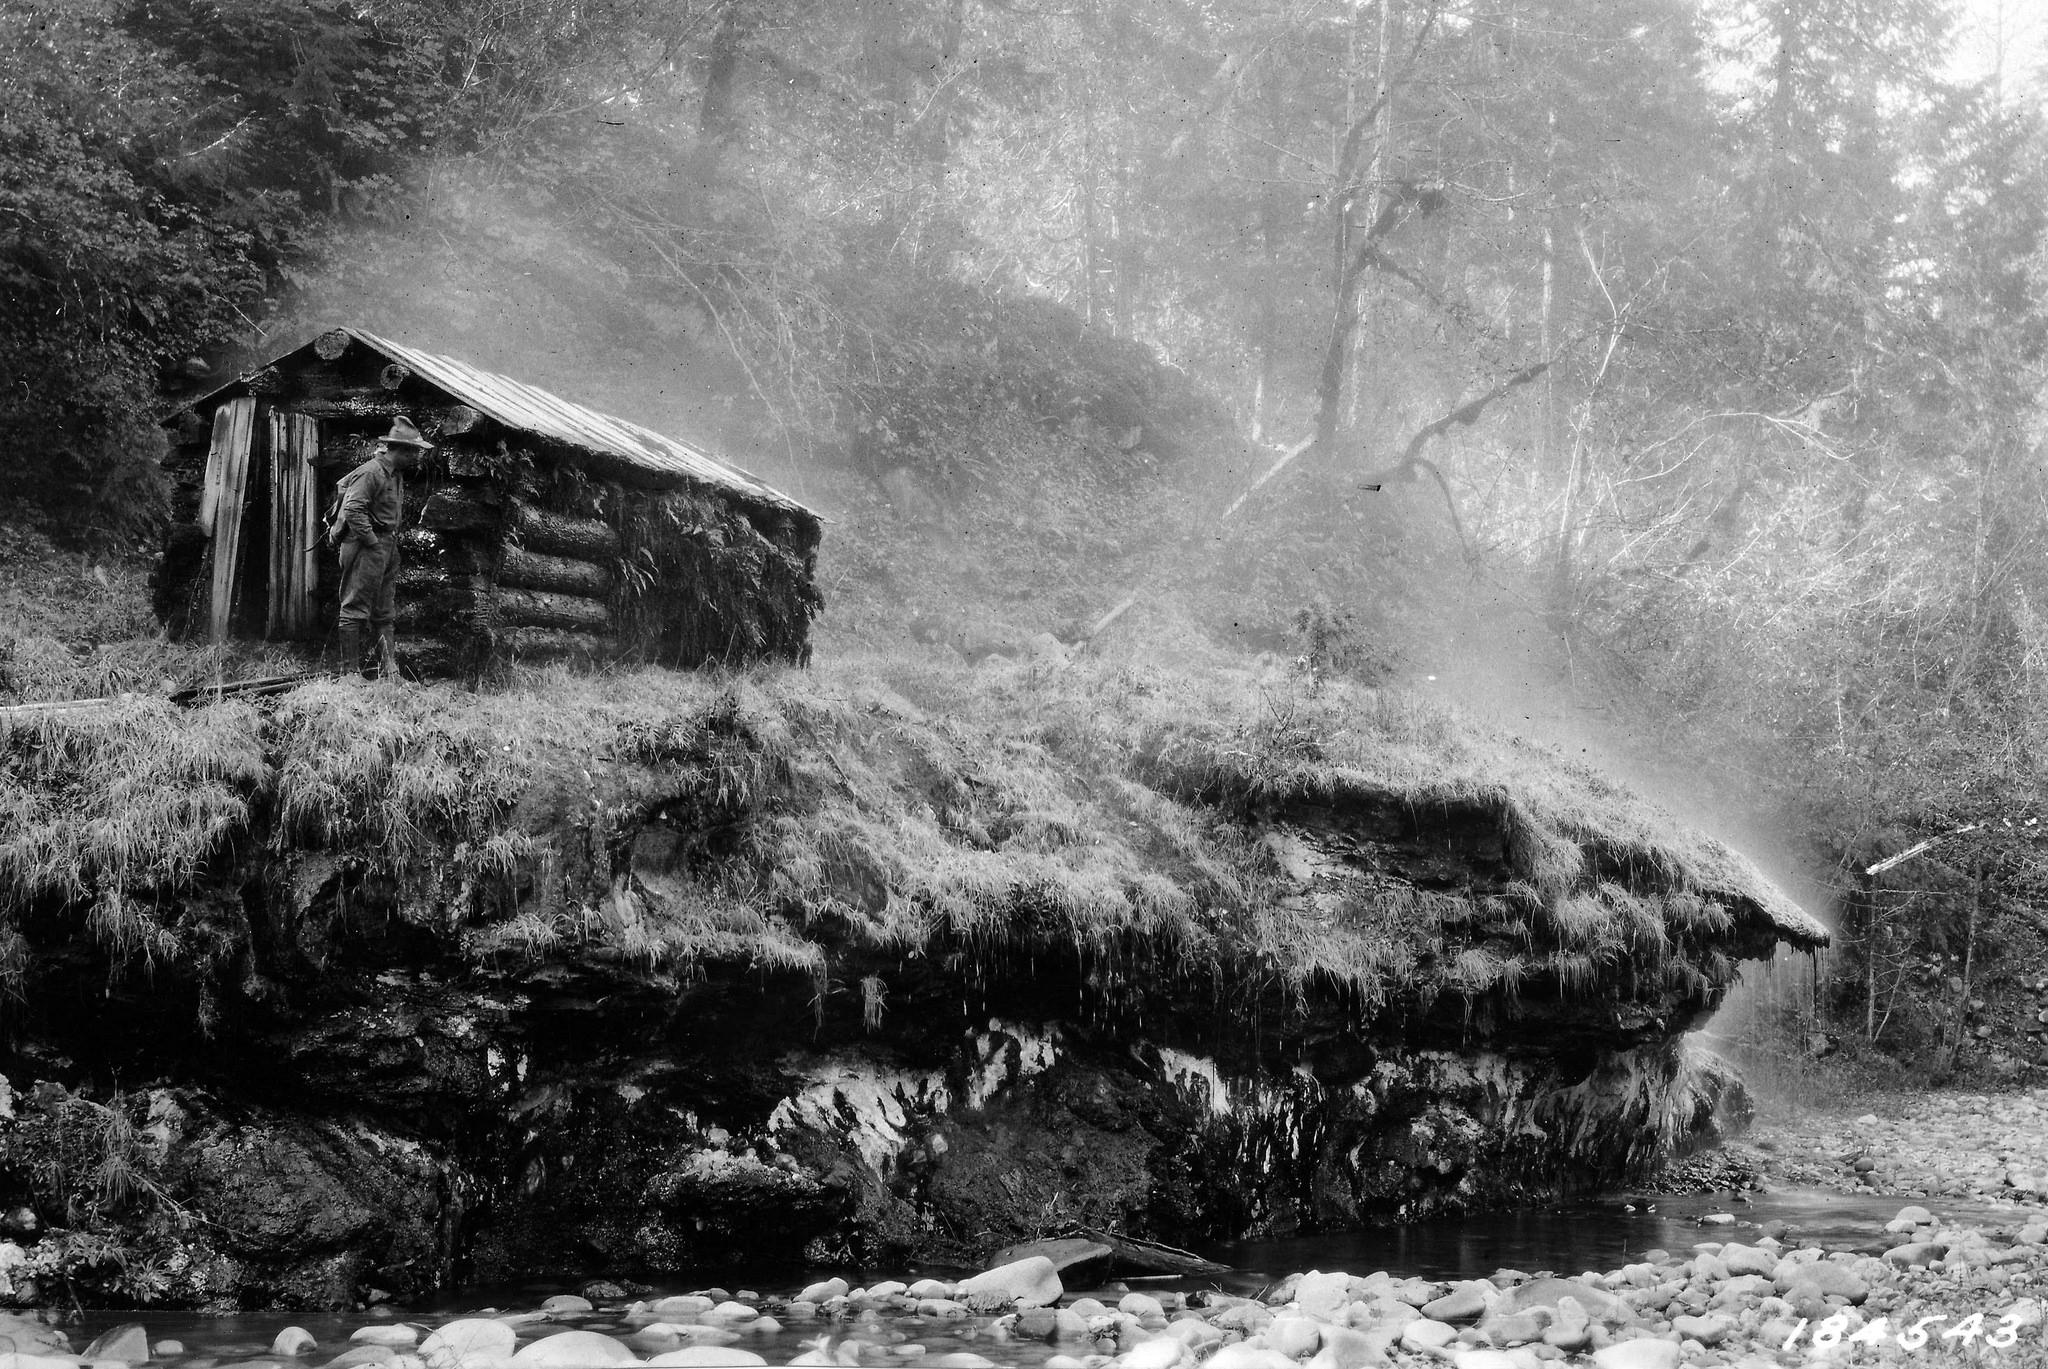 184543 Breitenbush Hot Springs Sweat House, Santiam NF, OR 1923 (Flickr)